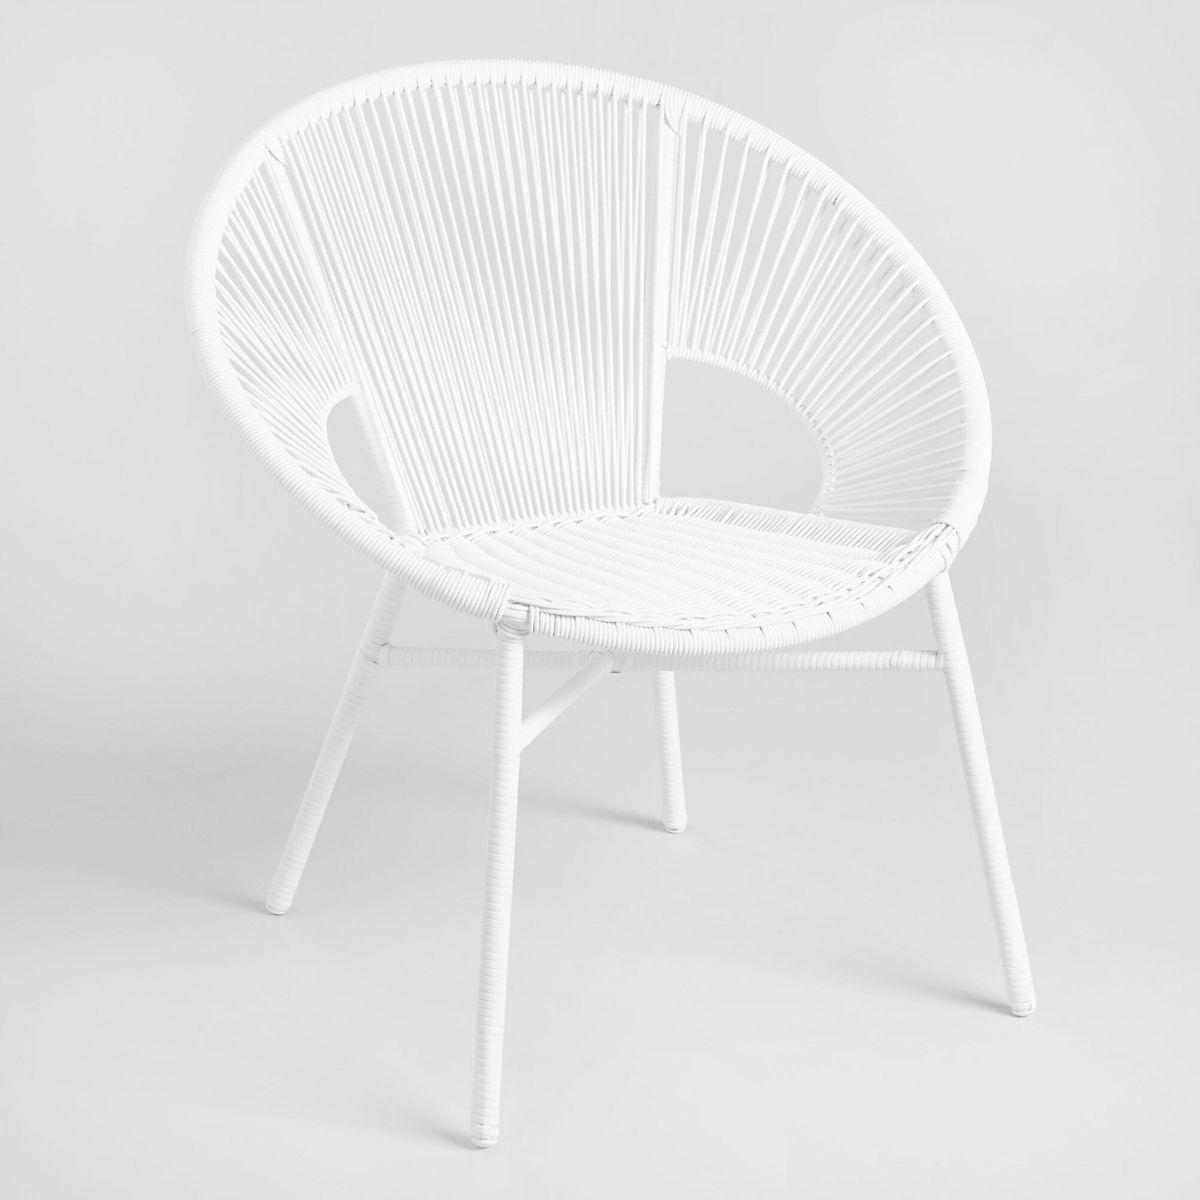 Round white outdoor chair.